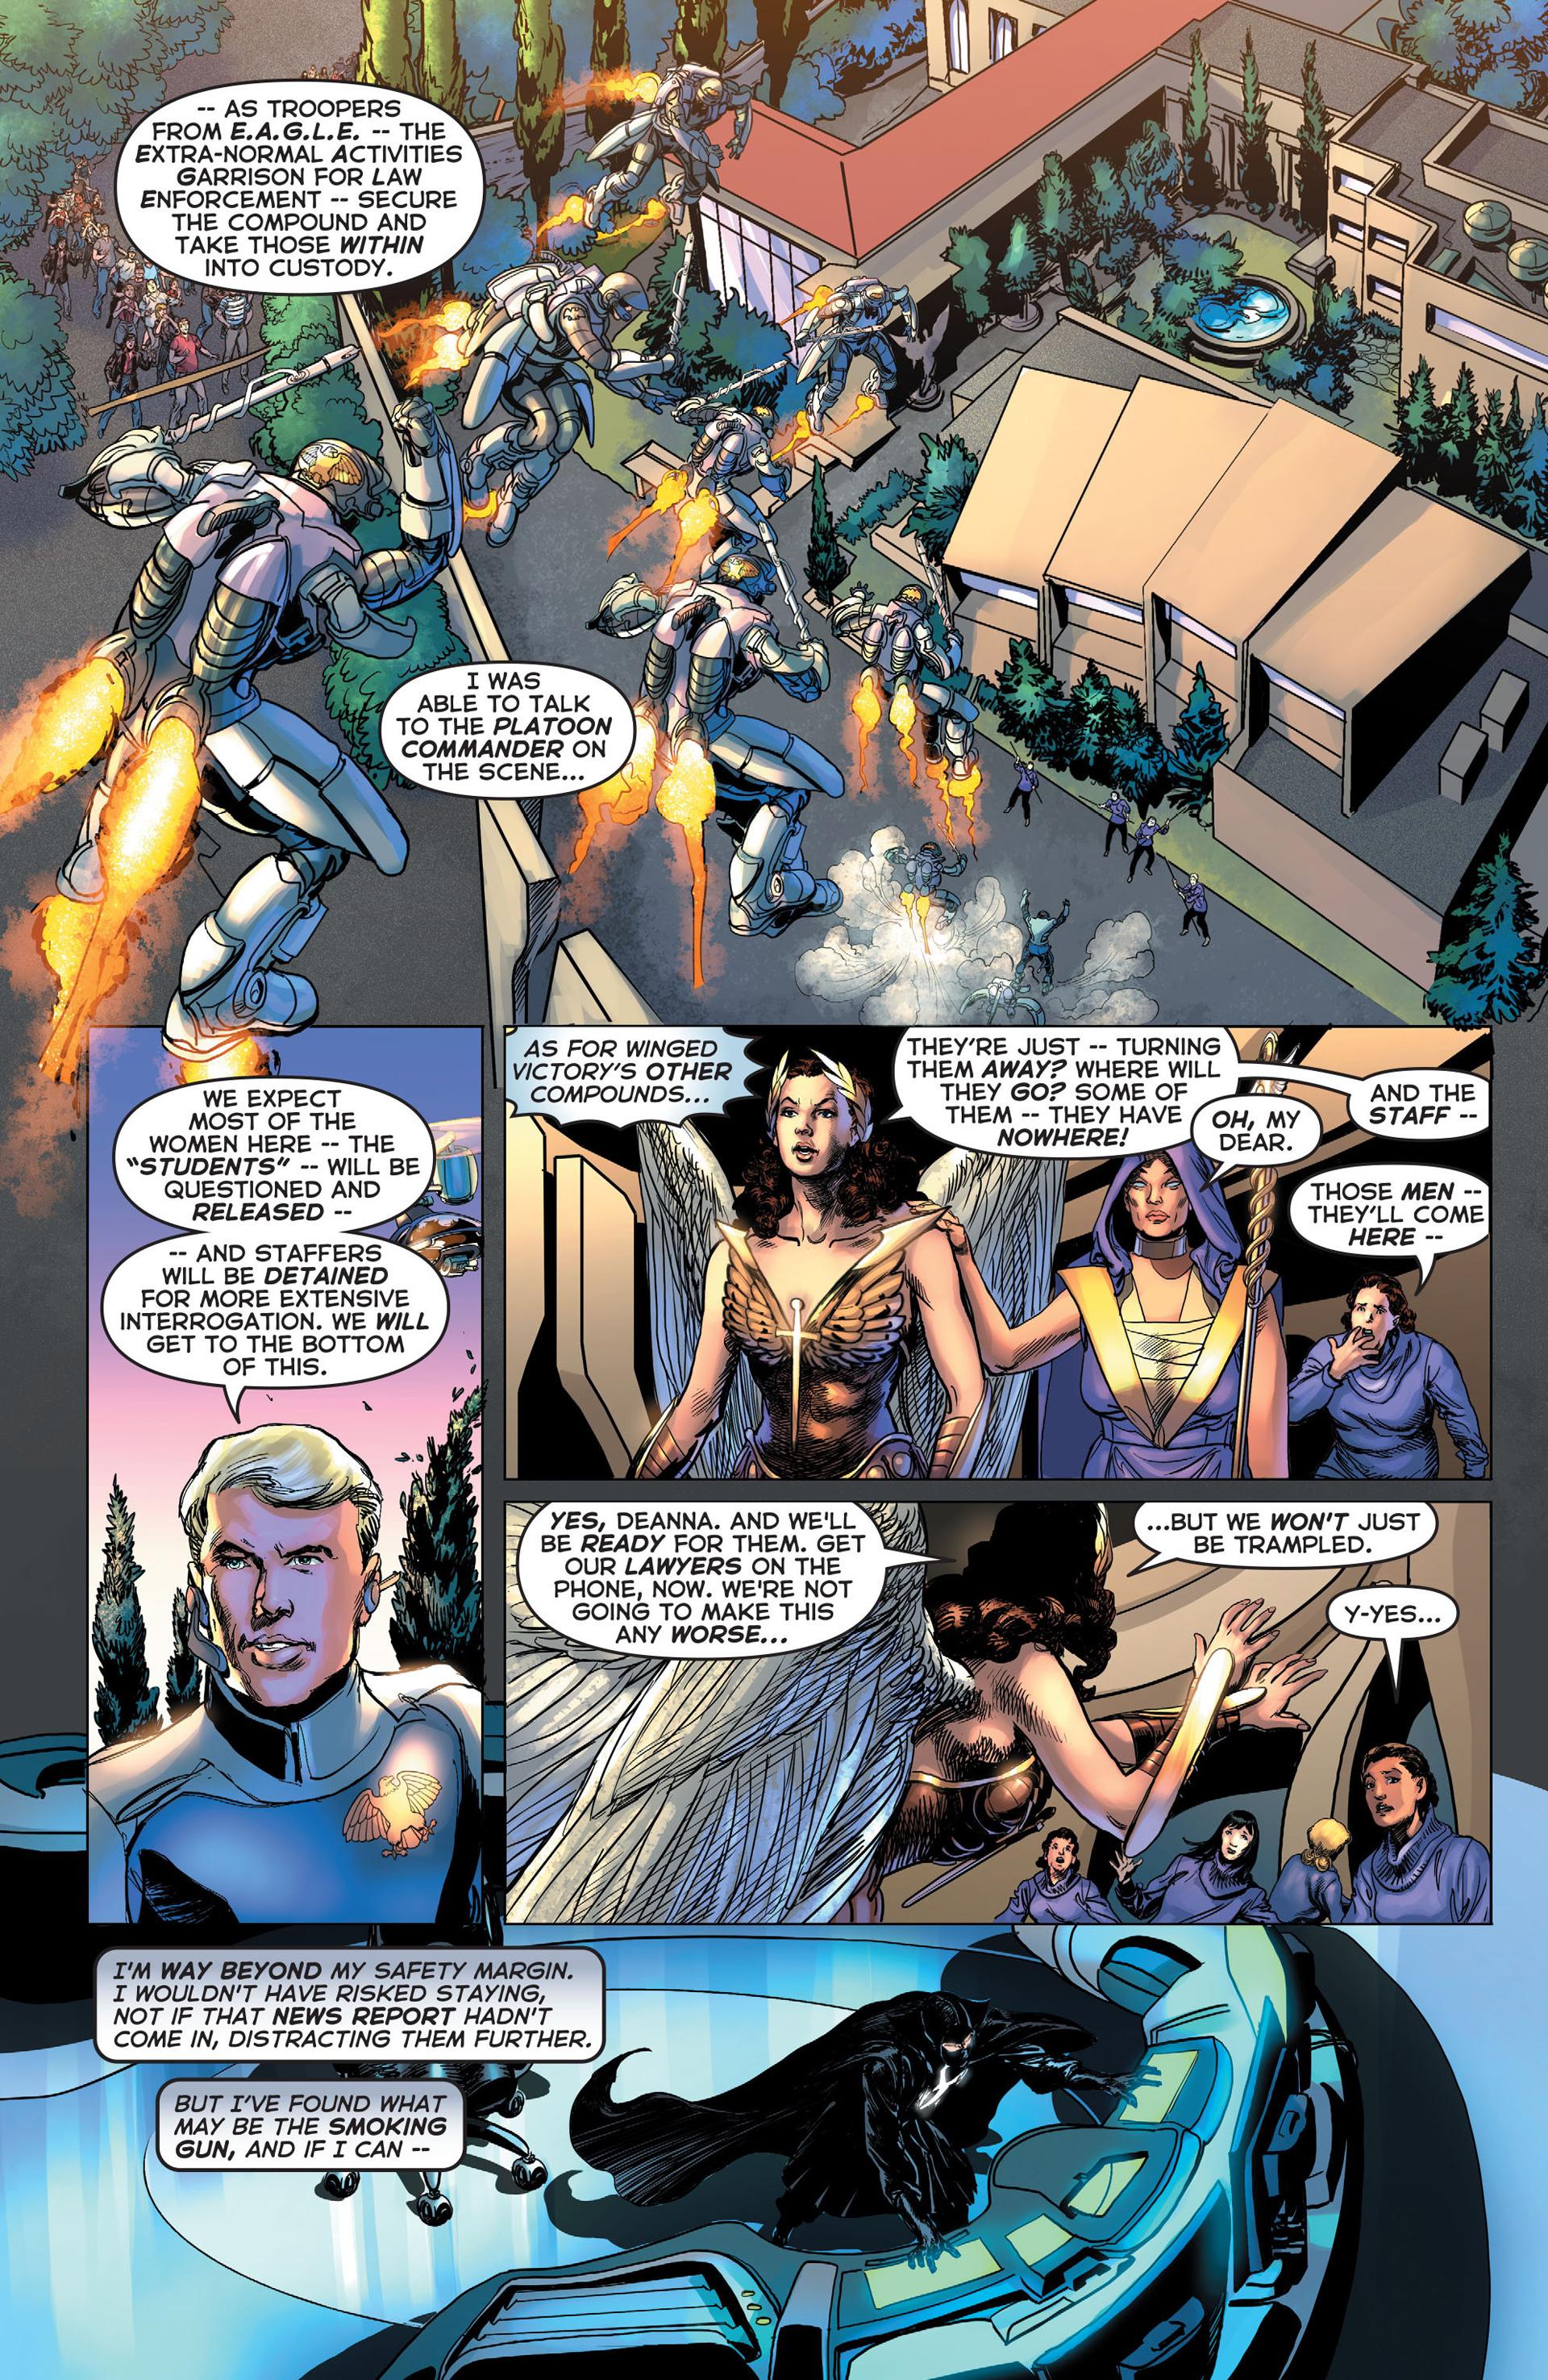 Read online Astro City comic -  Issue #8 - 8